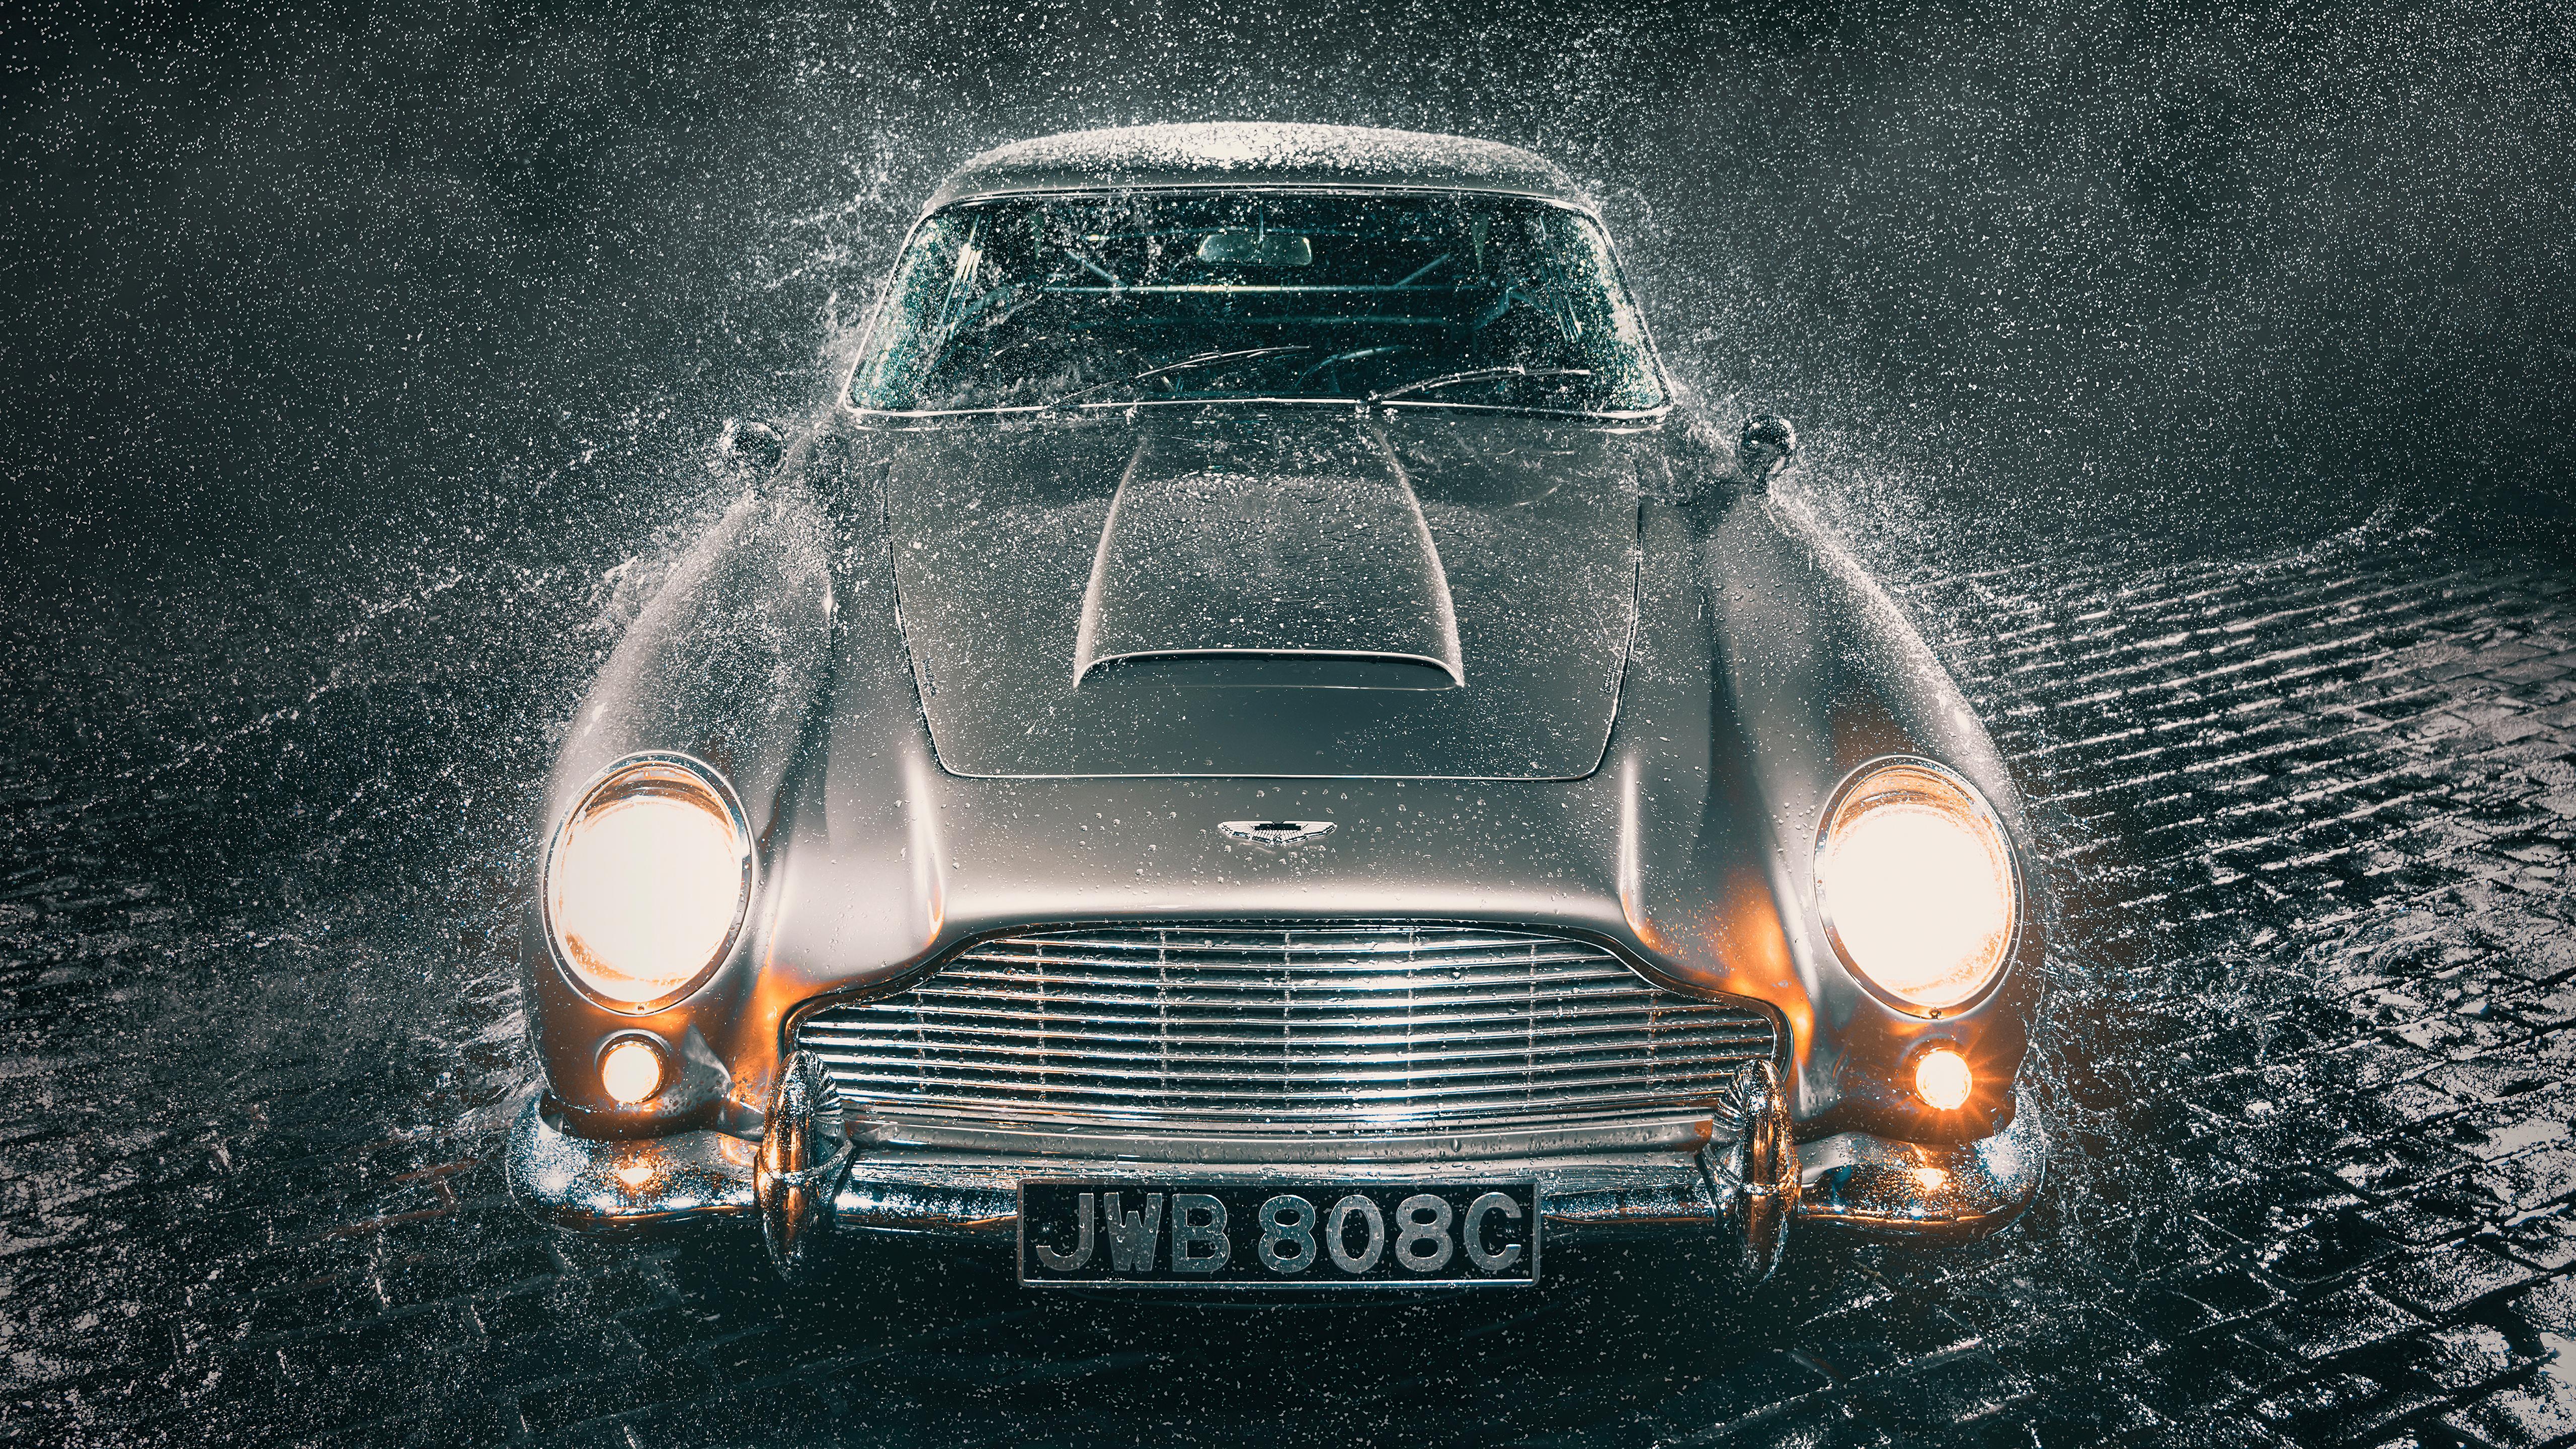 aston martin db5 4k 1620169614 - Aston Martin Db5 4k - Aston Martin Db5 4k wallpapers